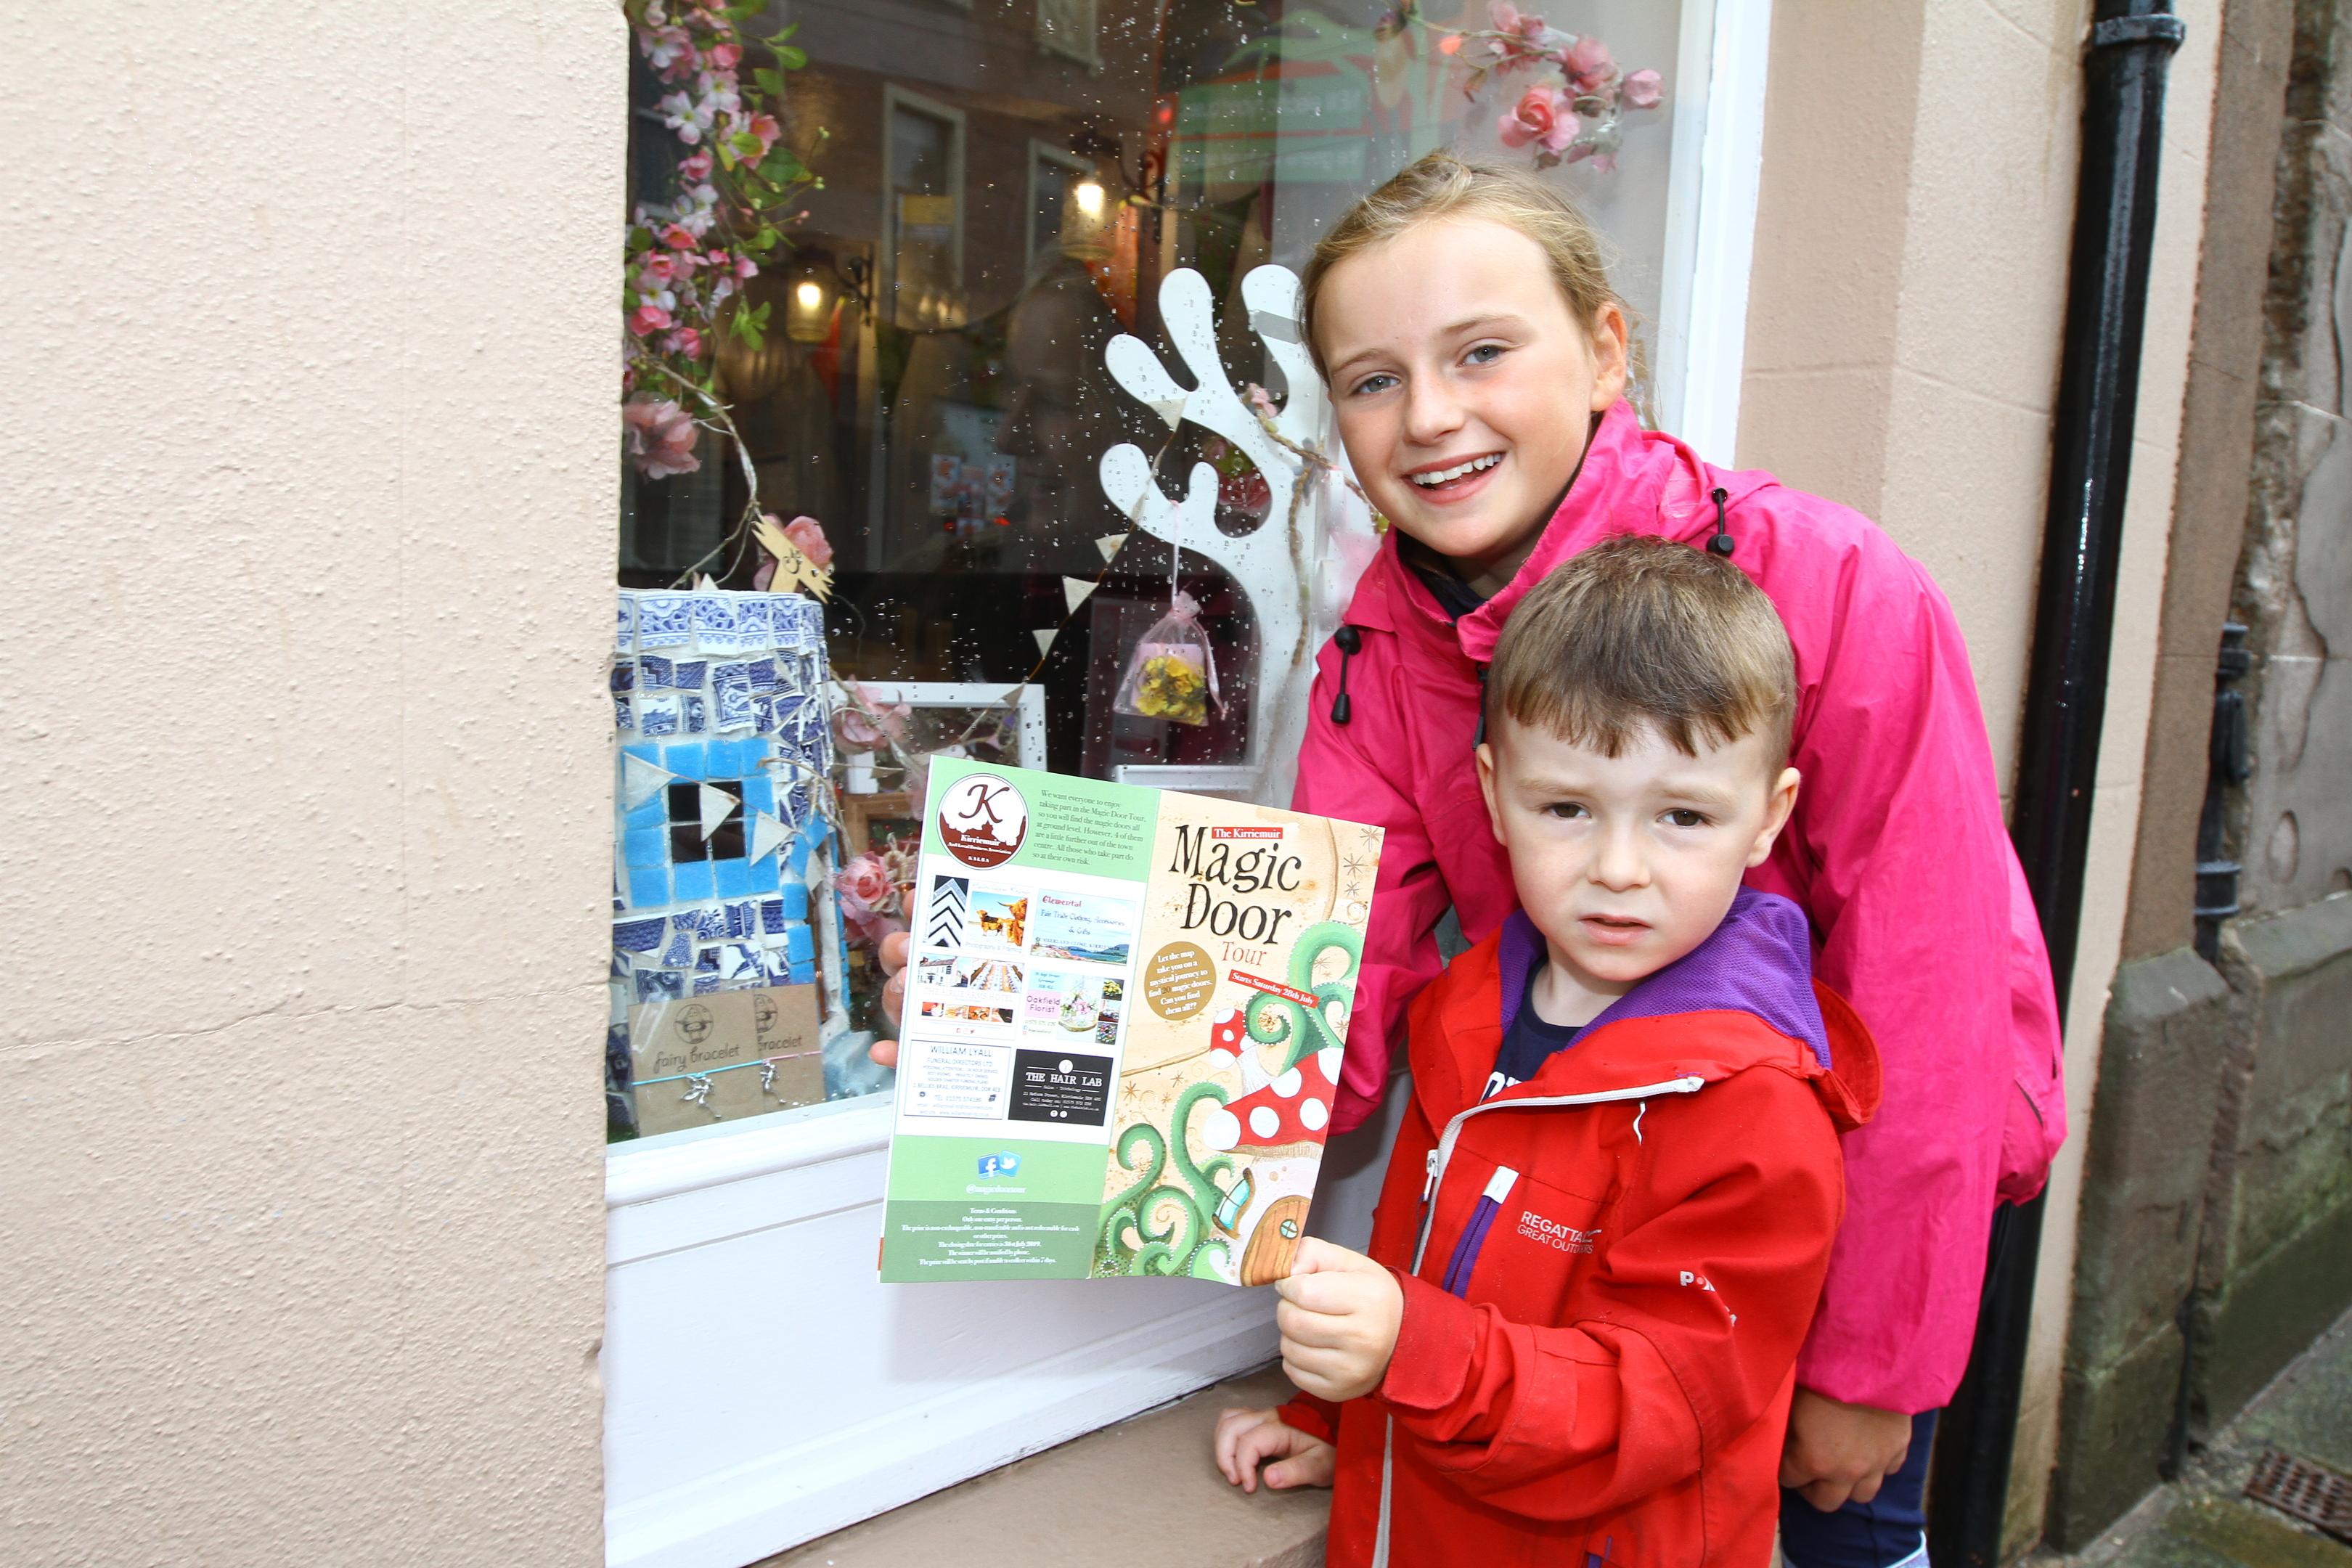 Courier Angus news-job CR0002748-   Mya Duncan Walker (11) & Cairn Hamilton (4) looking in shop windows to find the magic doors as part of the Magic Door Tour in Kirriemuir,saturday 28th july.